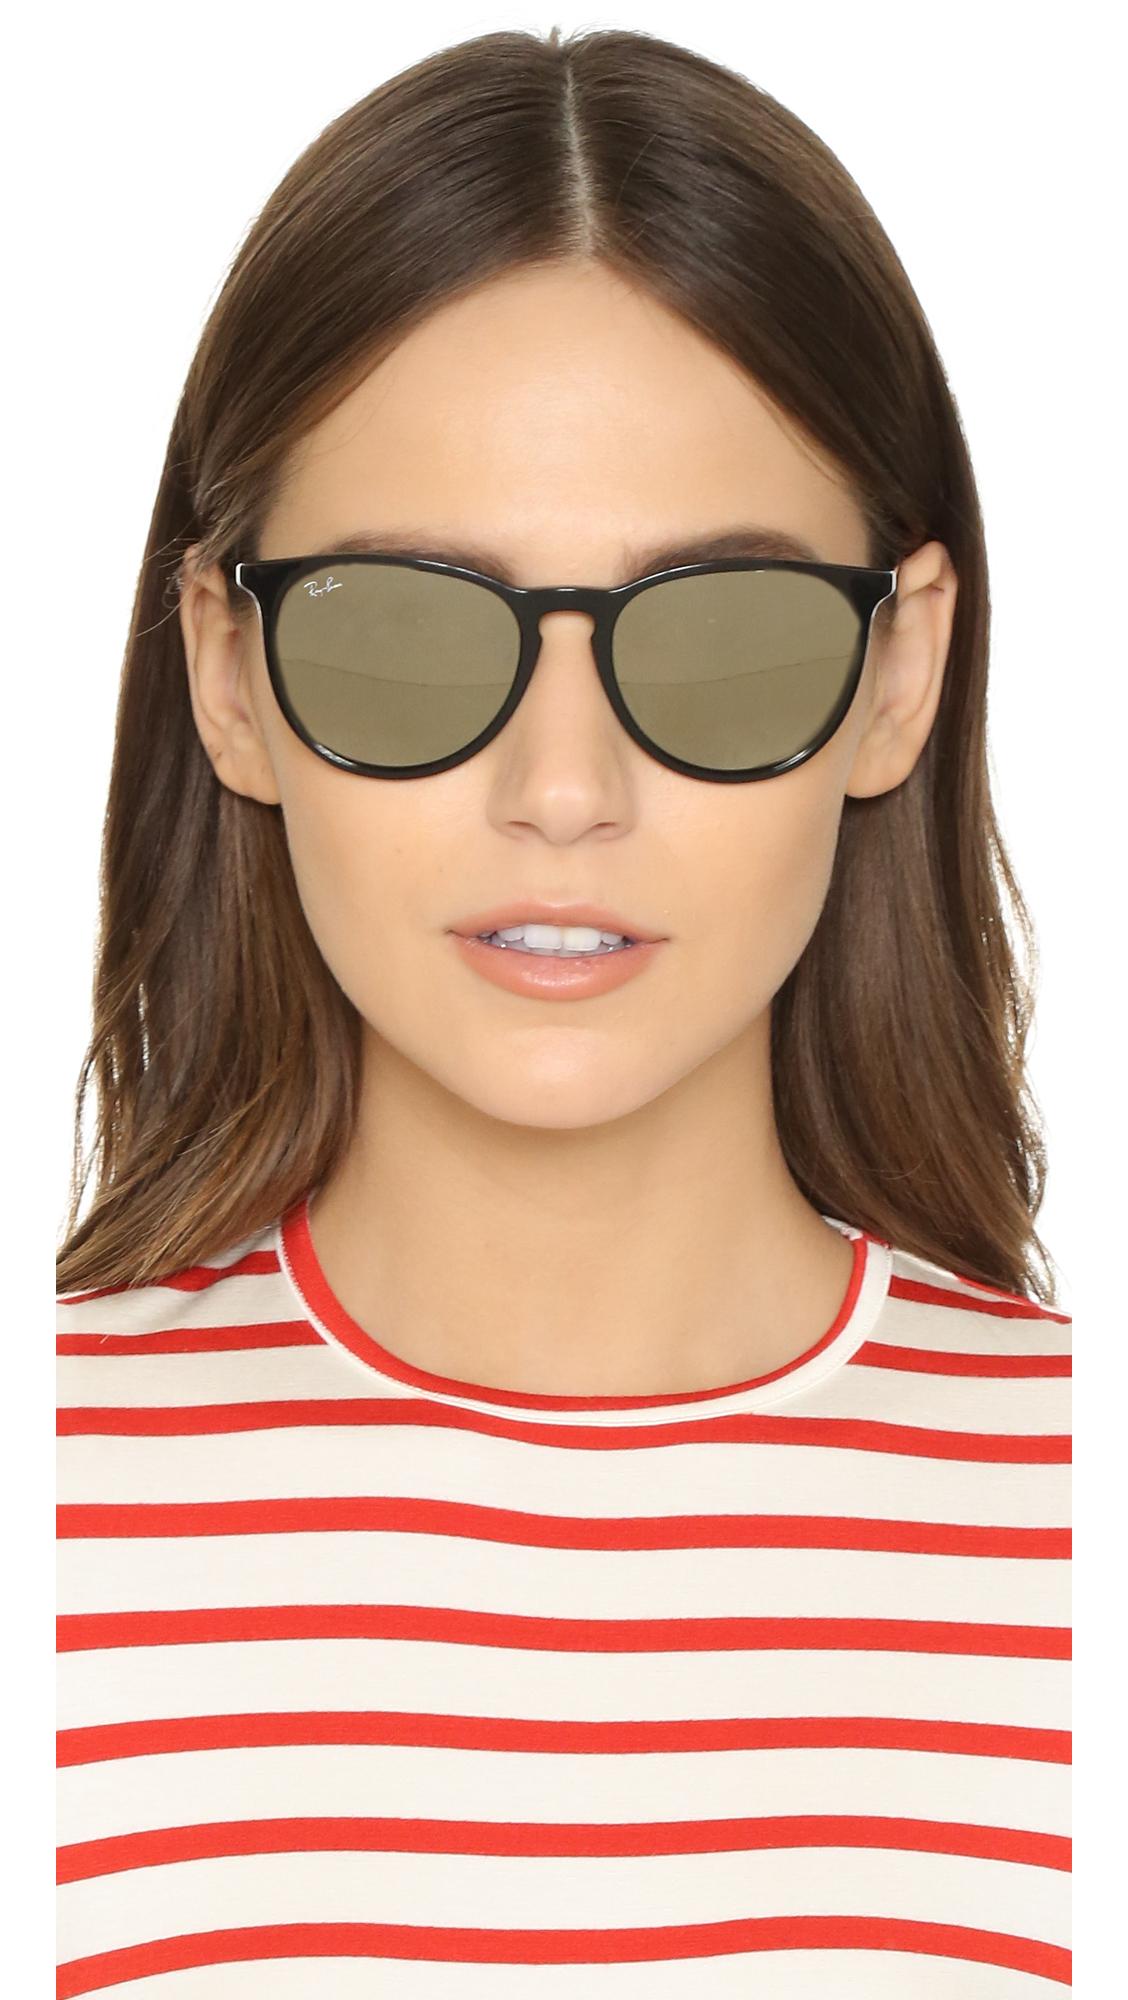 ray ban erika gold  Ray-ban Erika Sunglasses in Black